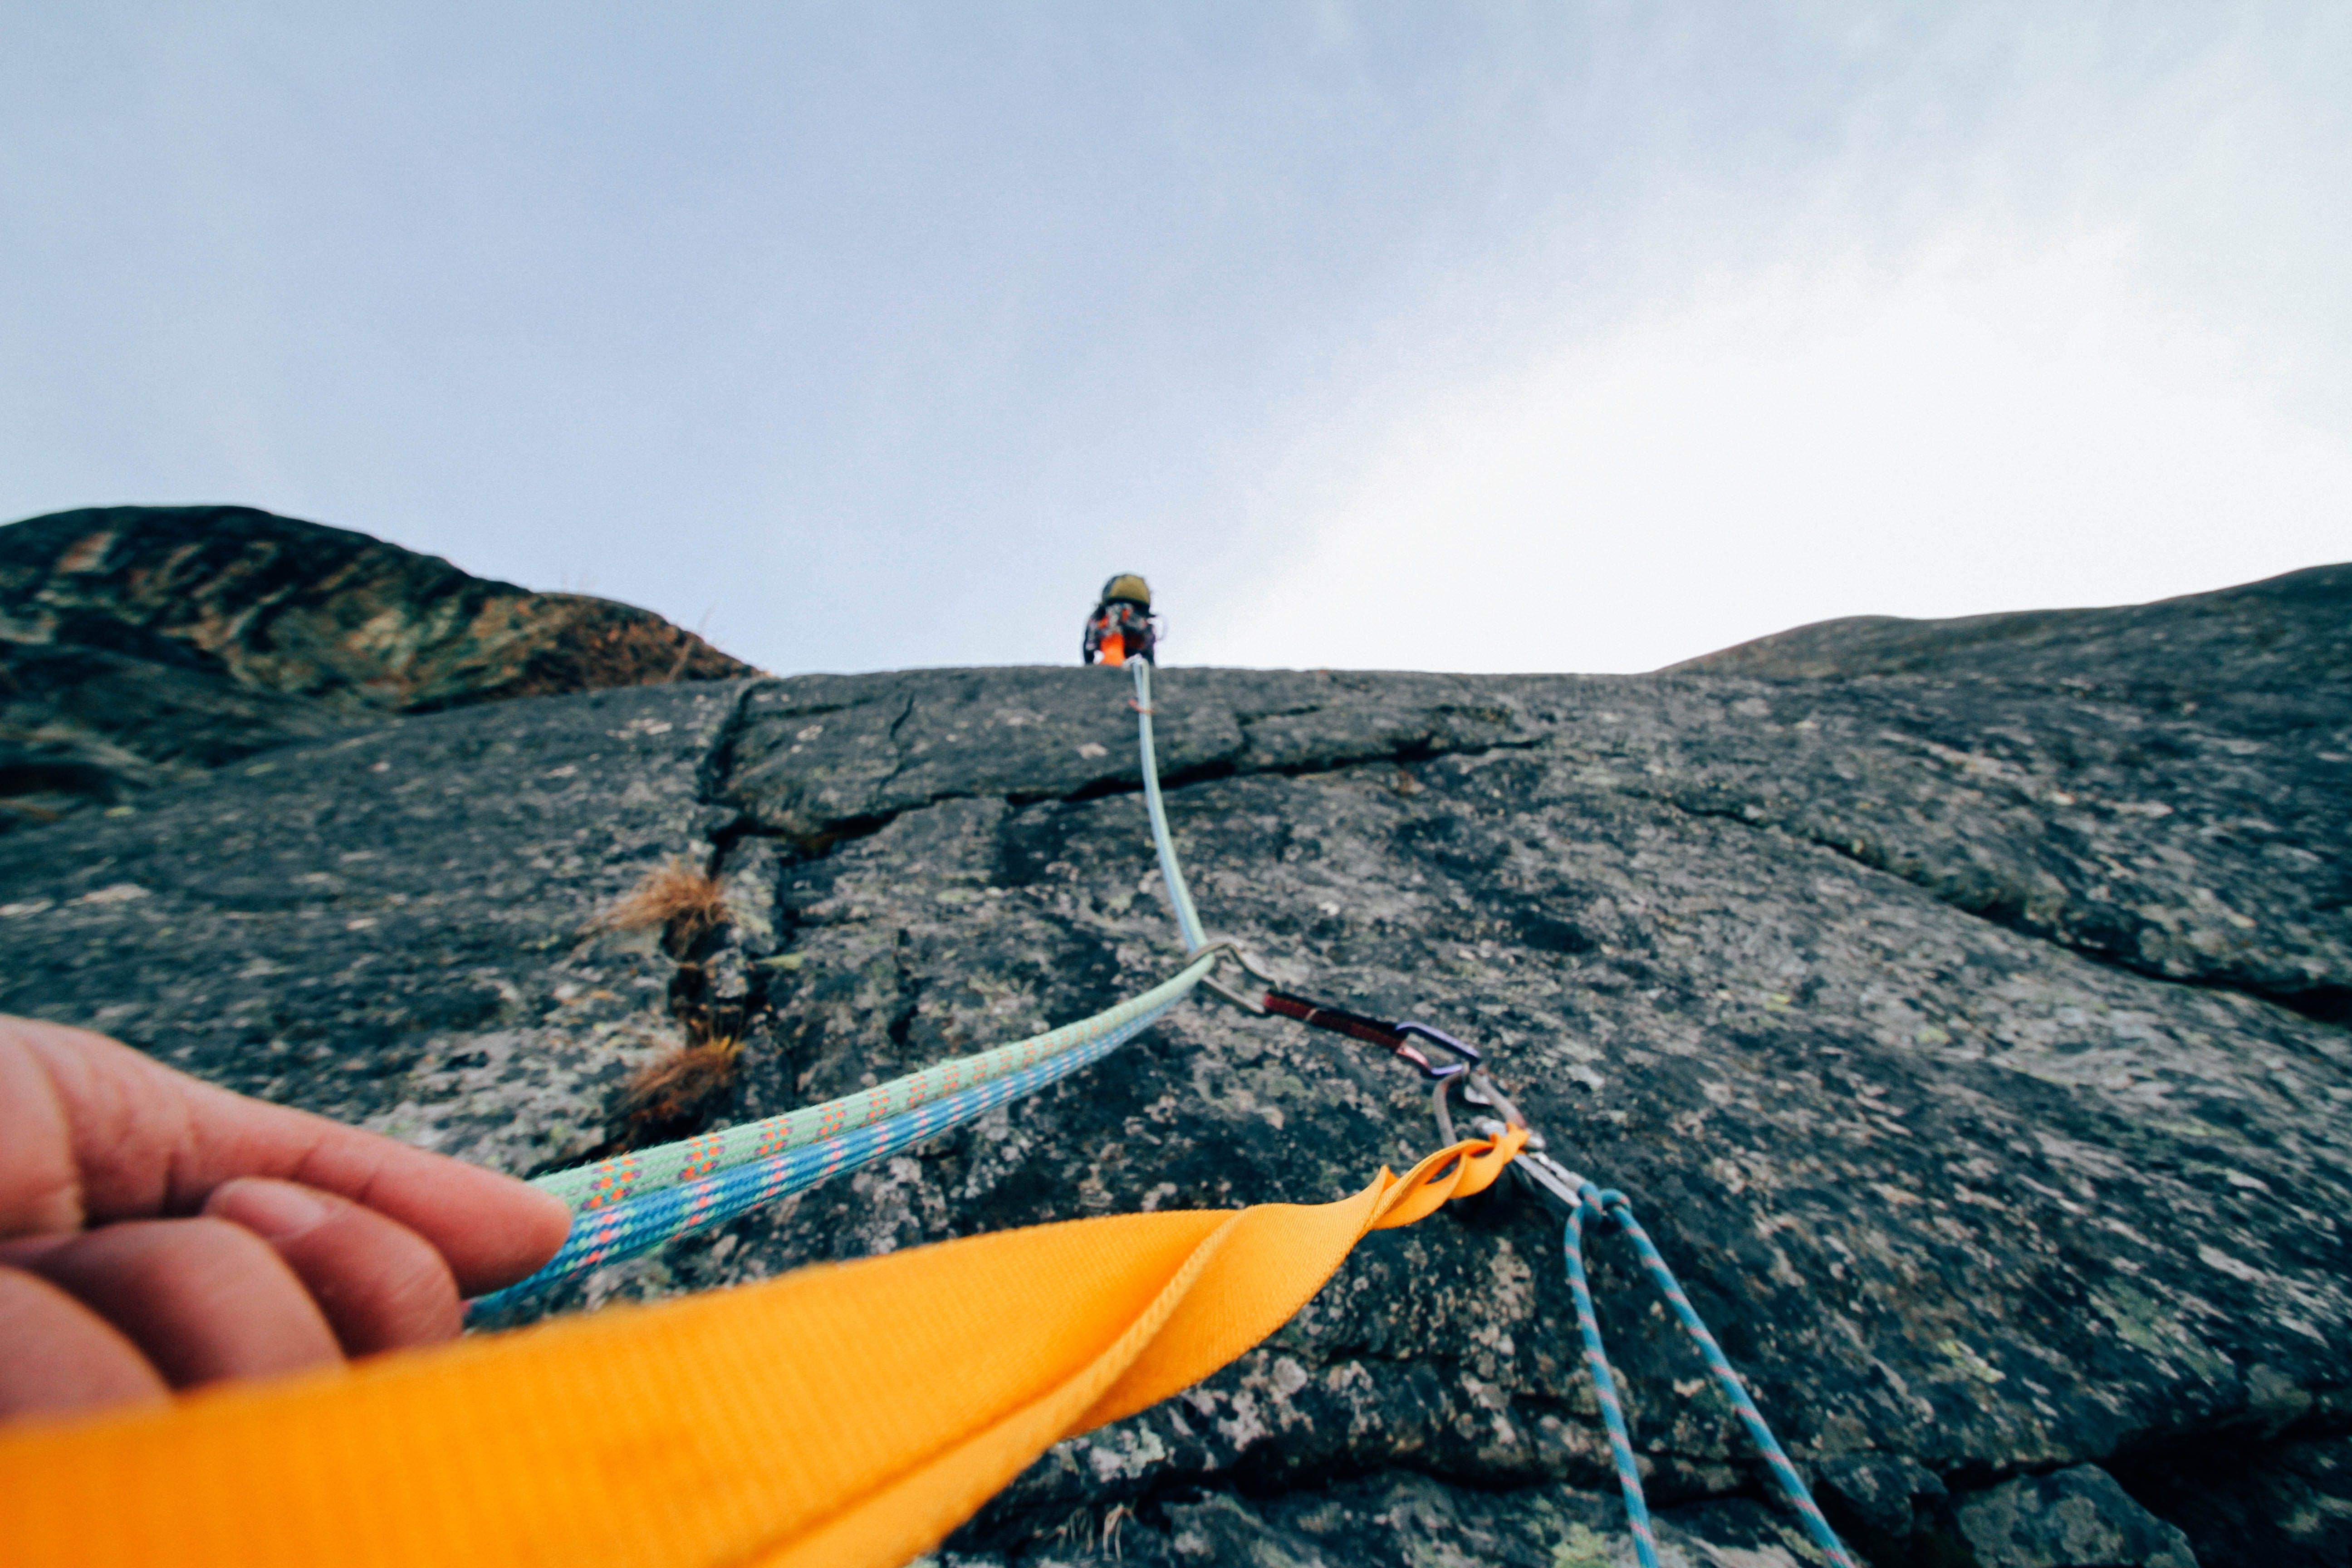 action, adventure, climbing